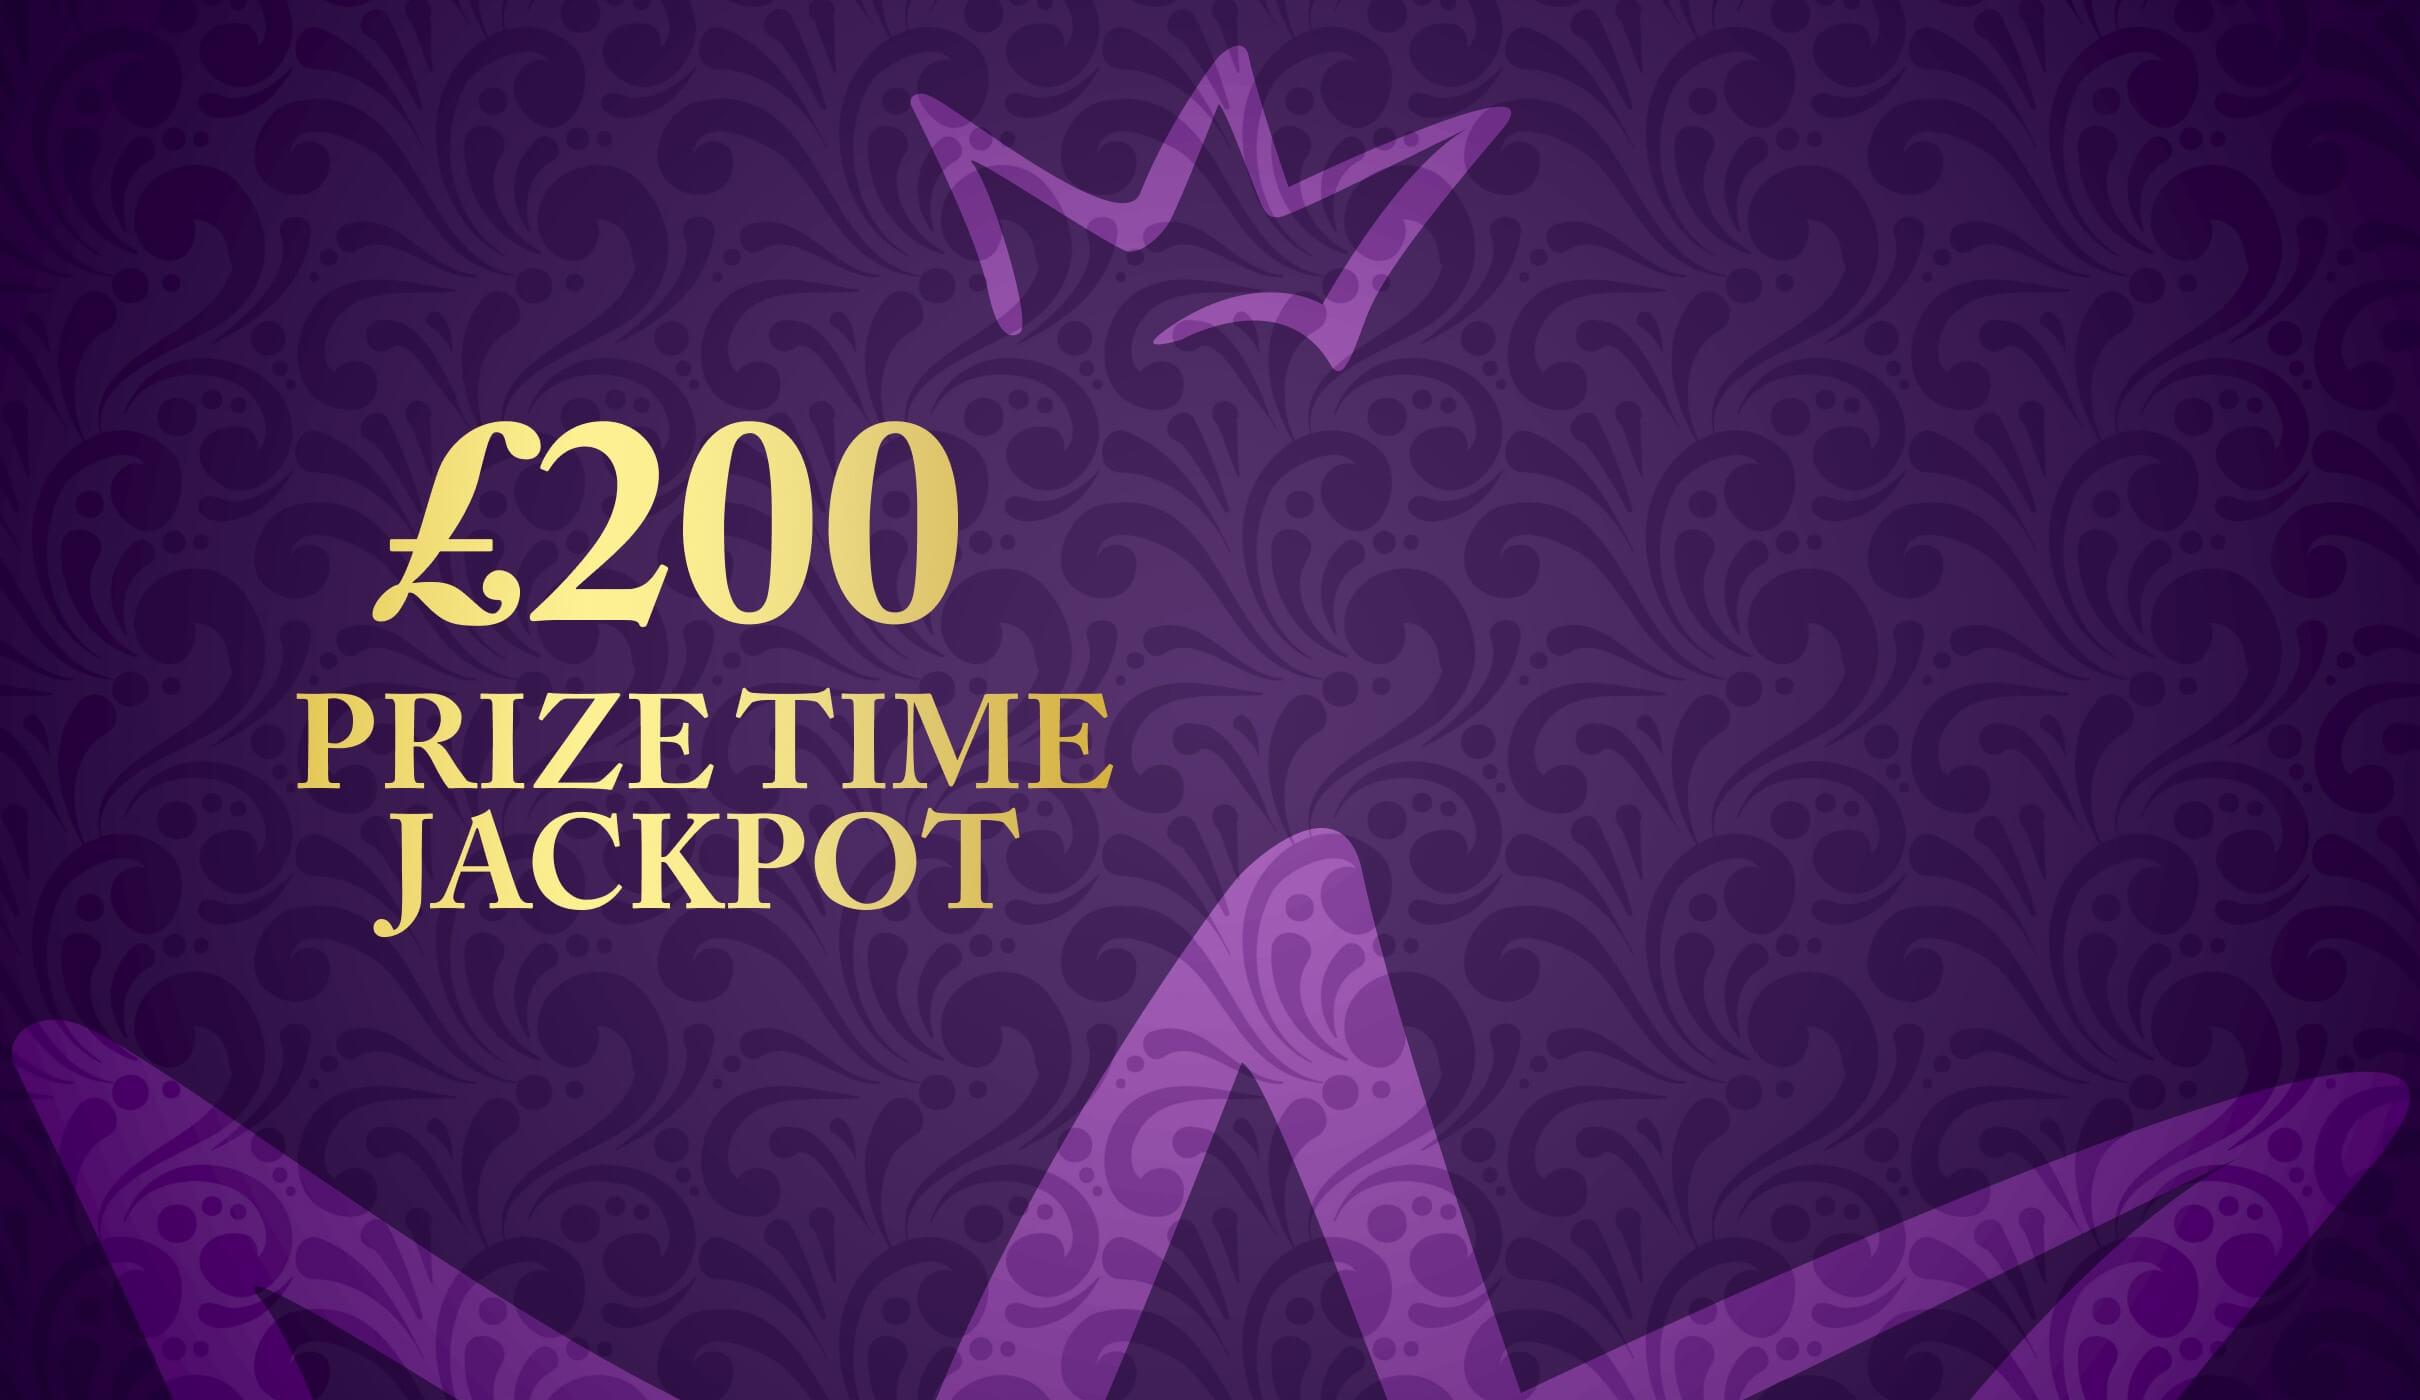 Prize Time